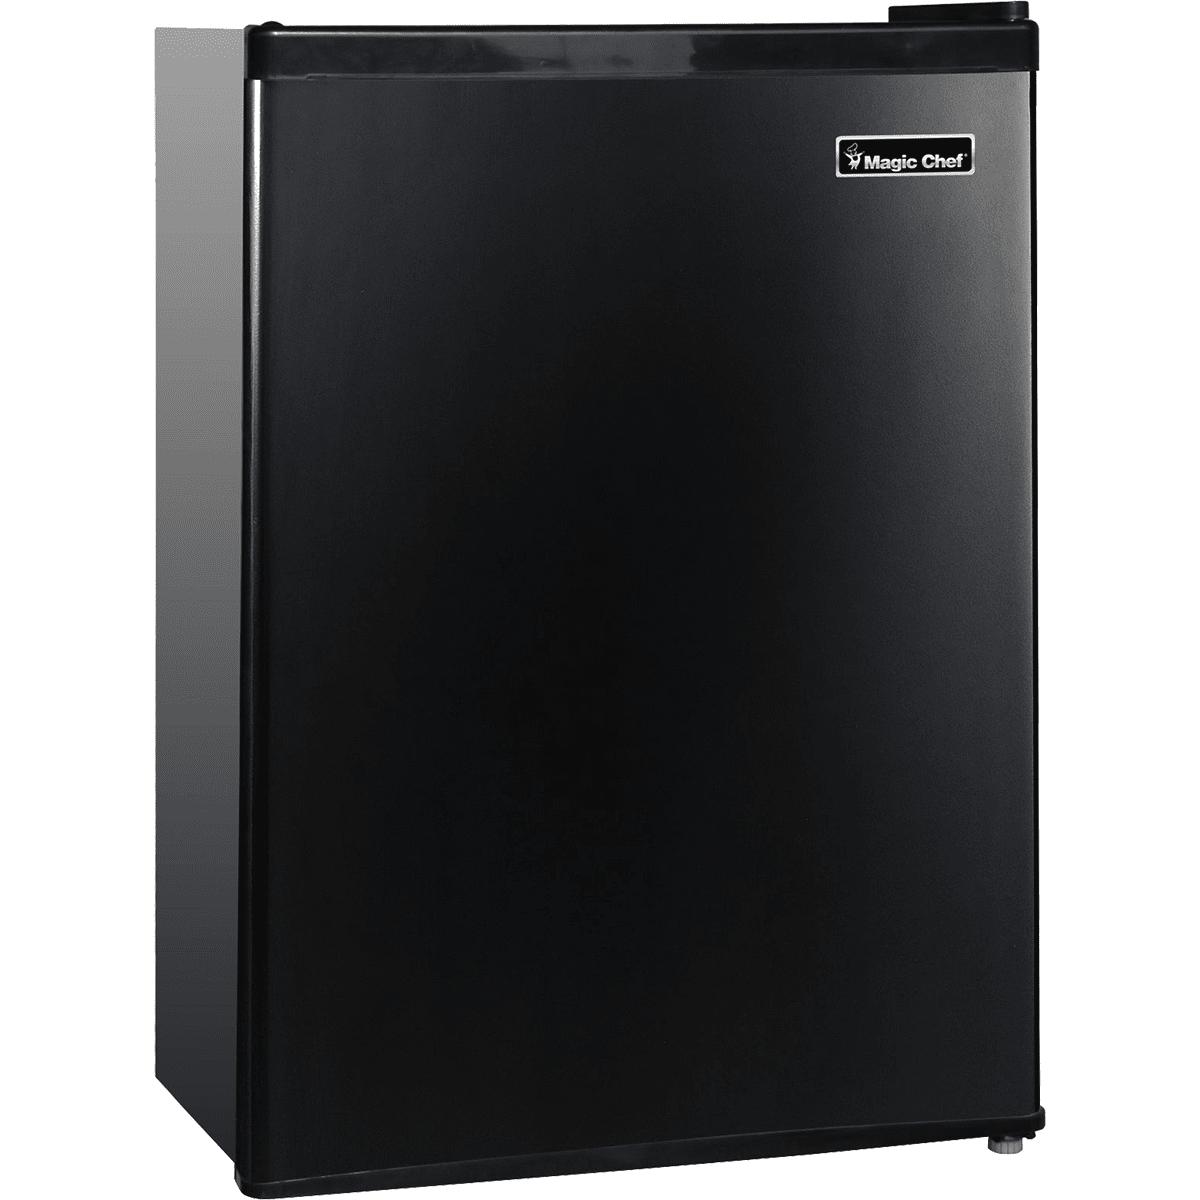 Image of Magic Chef 2.4 Cu. Ft. Mini Refrigerator w/ Half-Width Freezer - Black